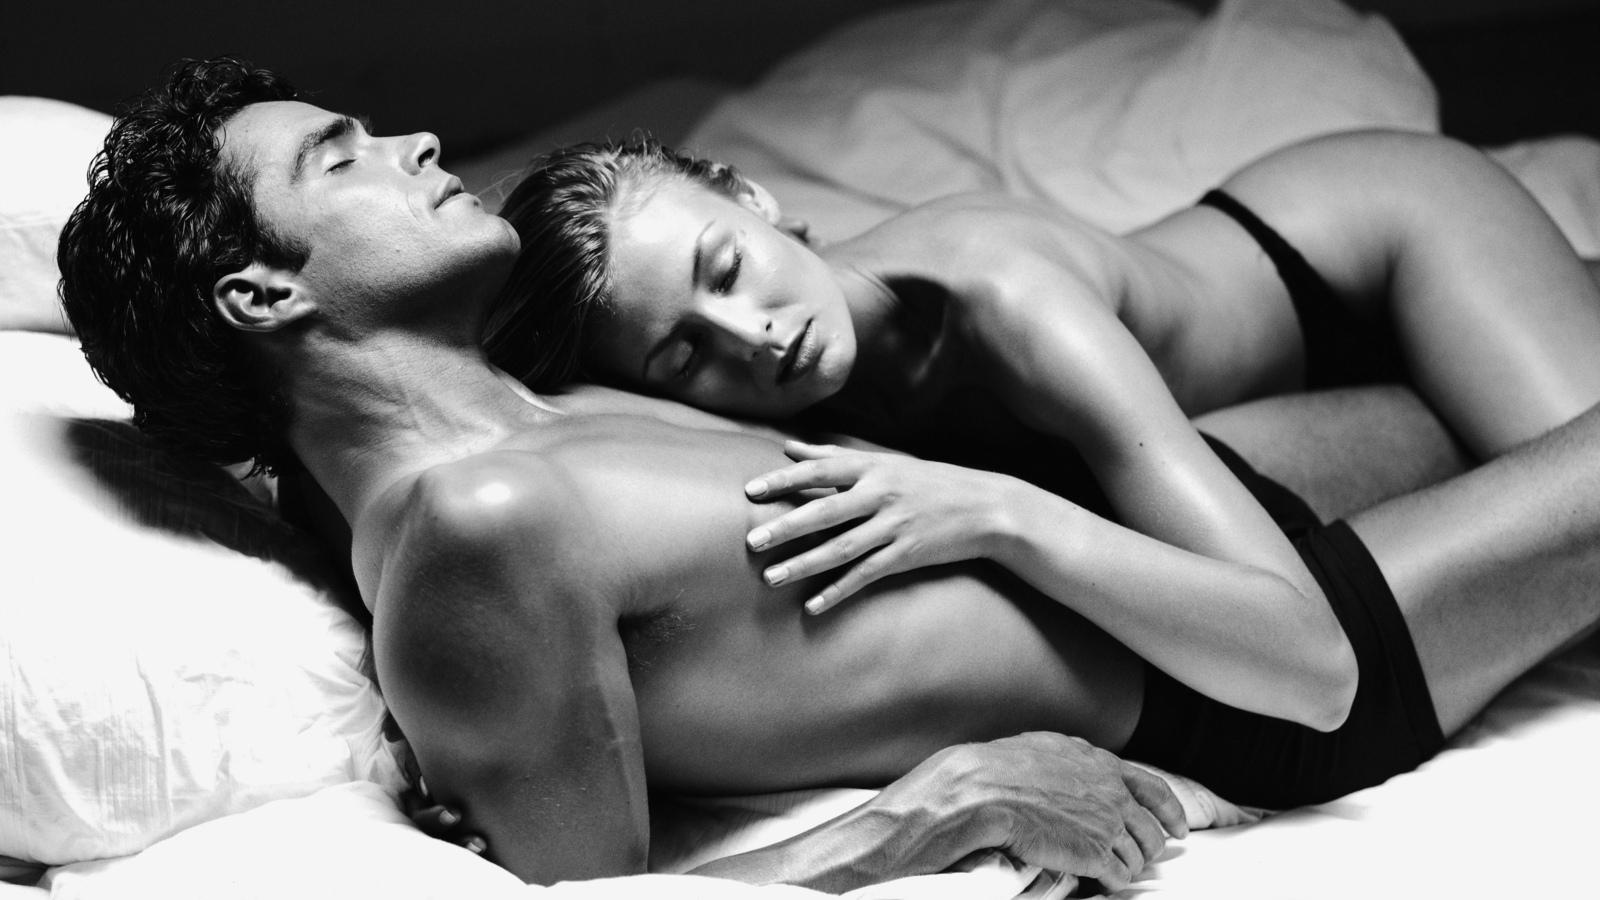 Эротика фото мужчин и женщина 10 фотография